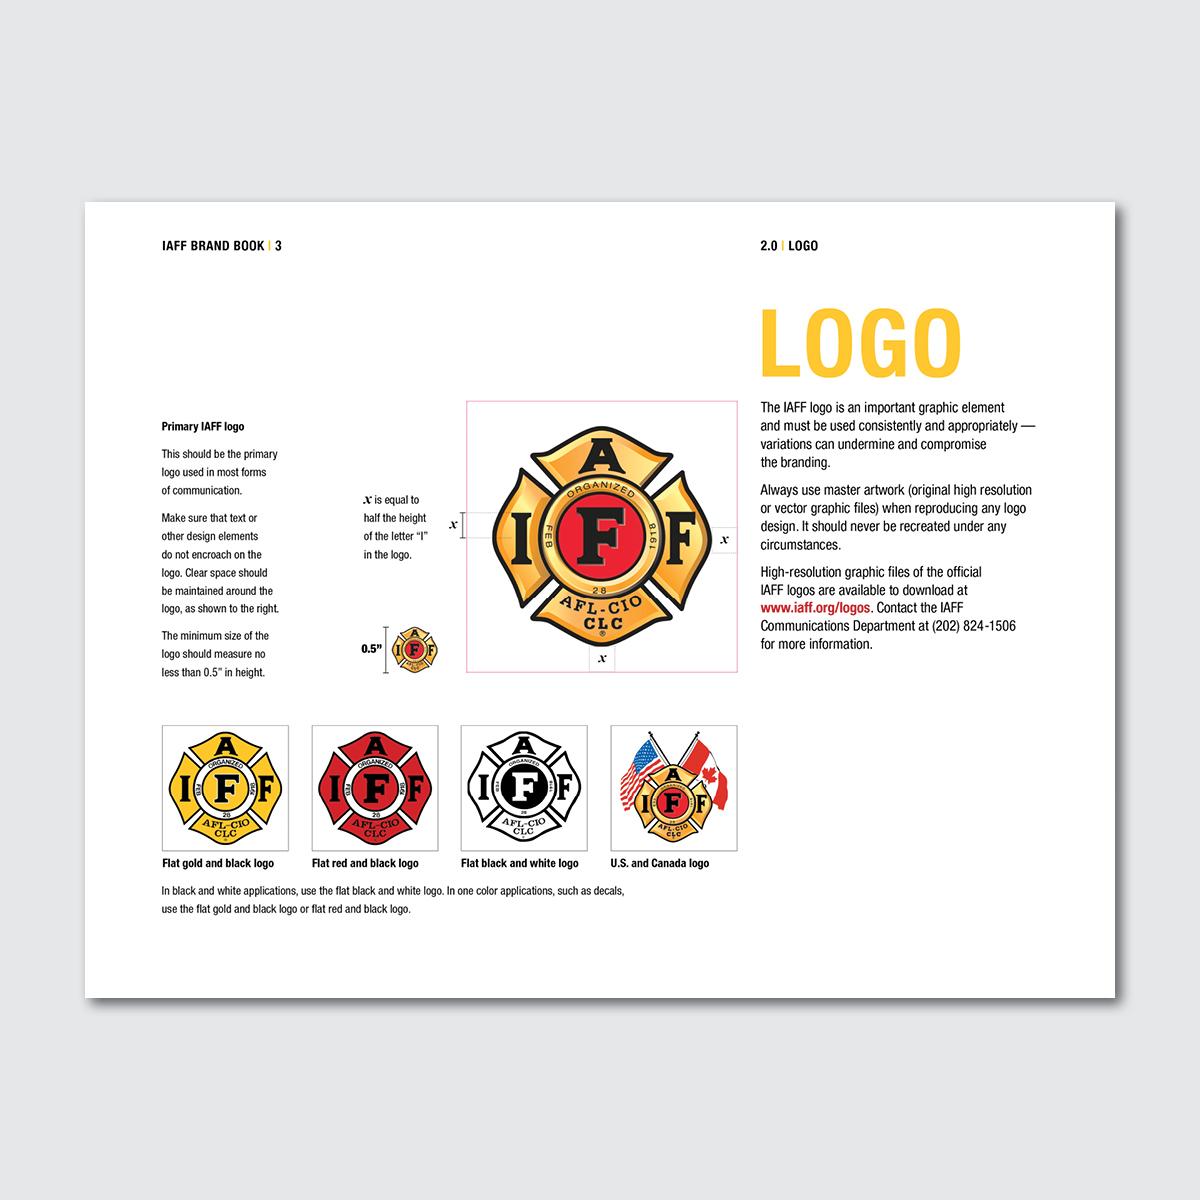 portfolio_IAFF_brandbook3.jpg